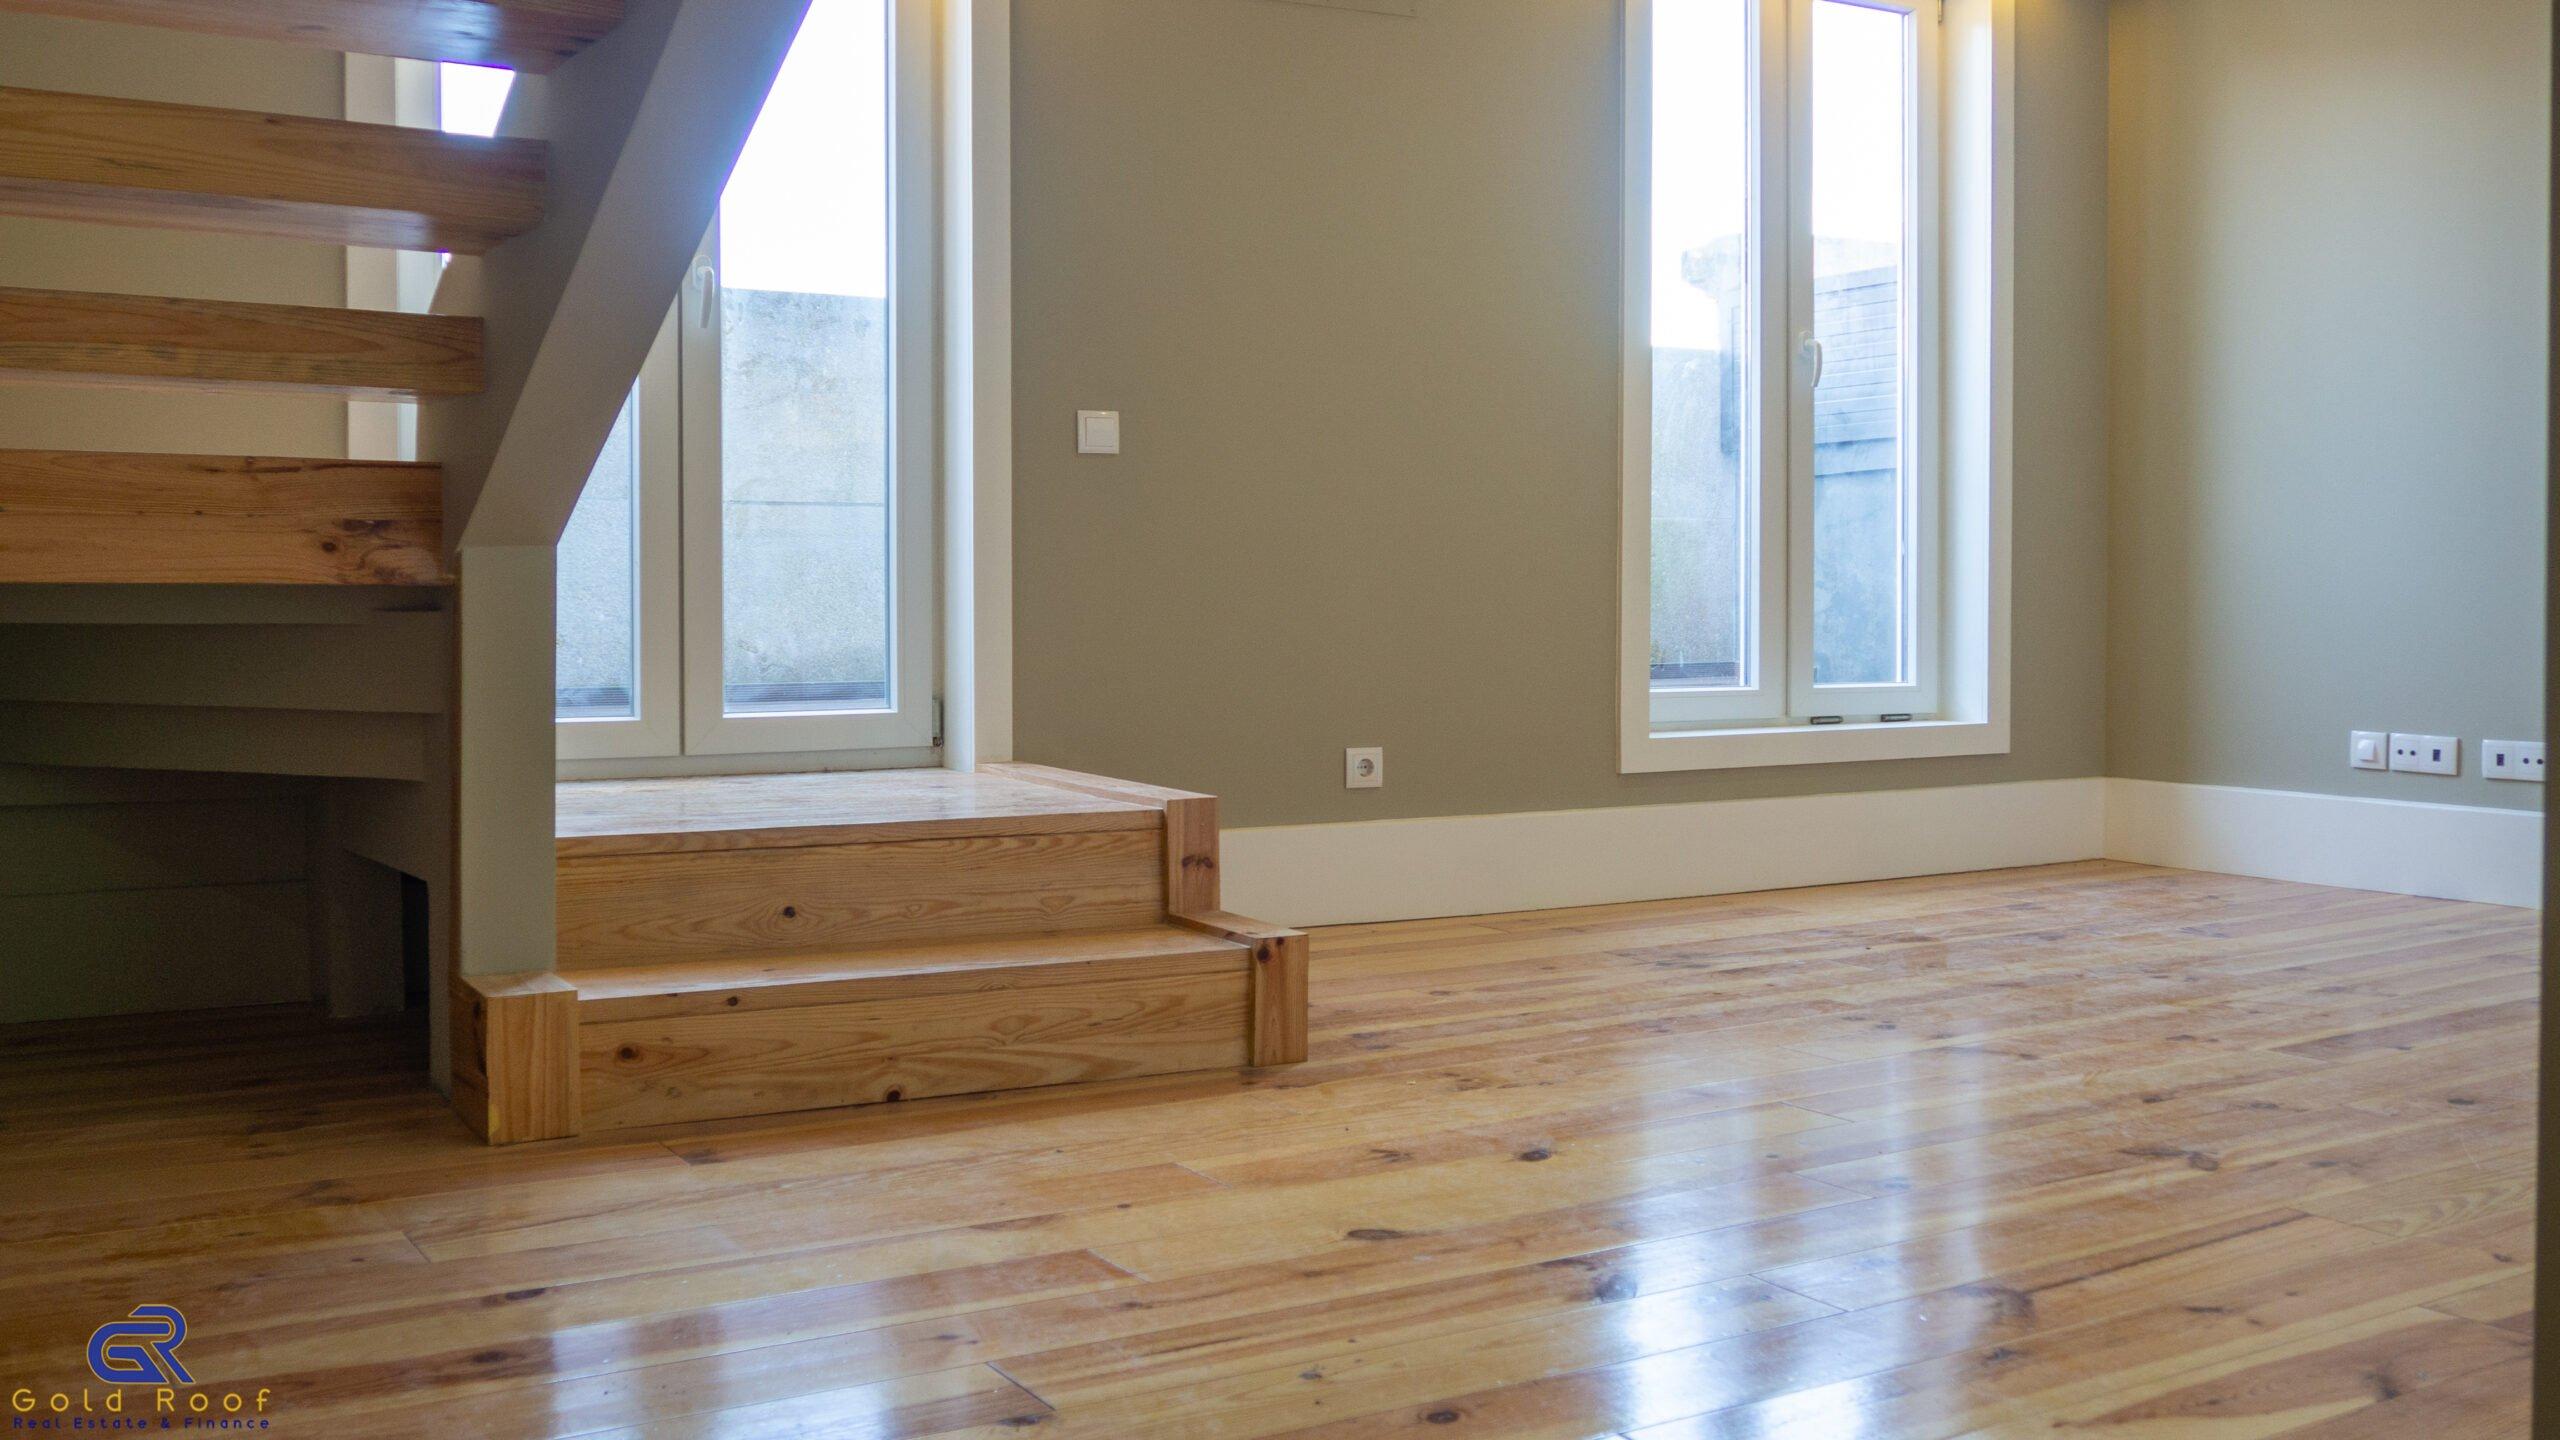 1-bedroom duplex apartment, fully refurbished, Oporto centre